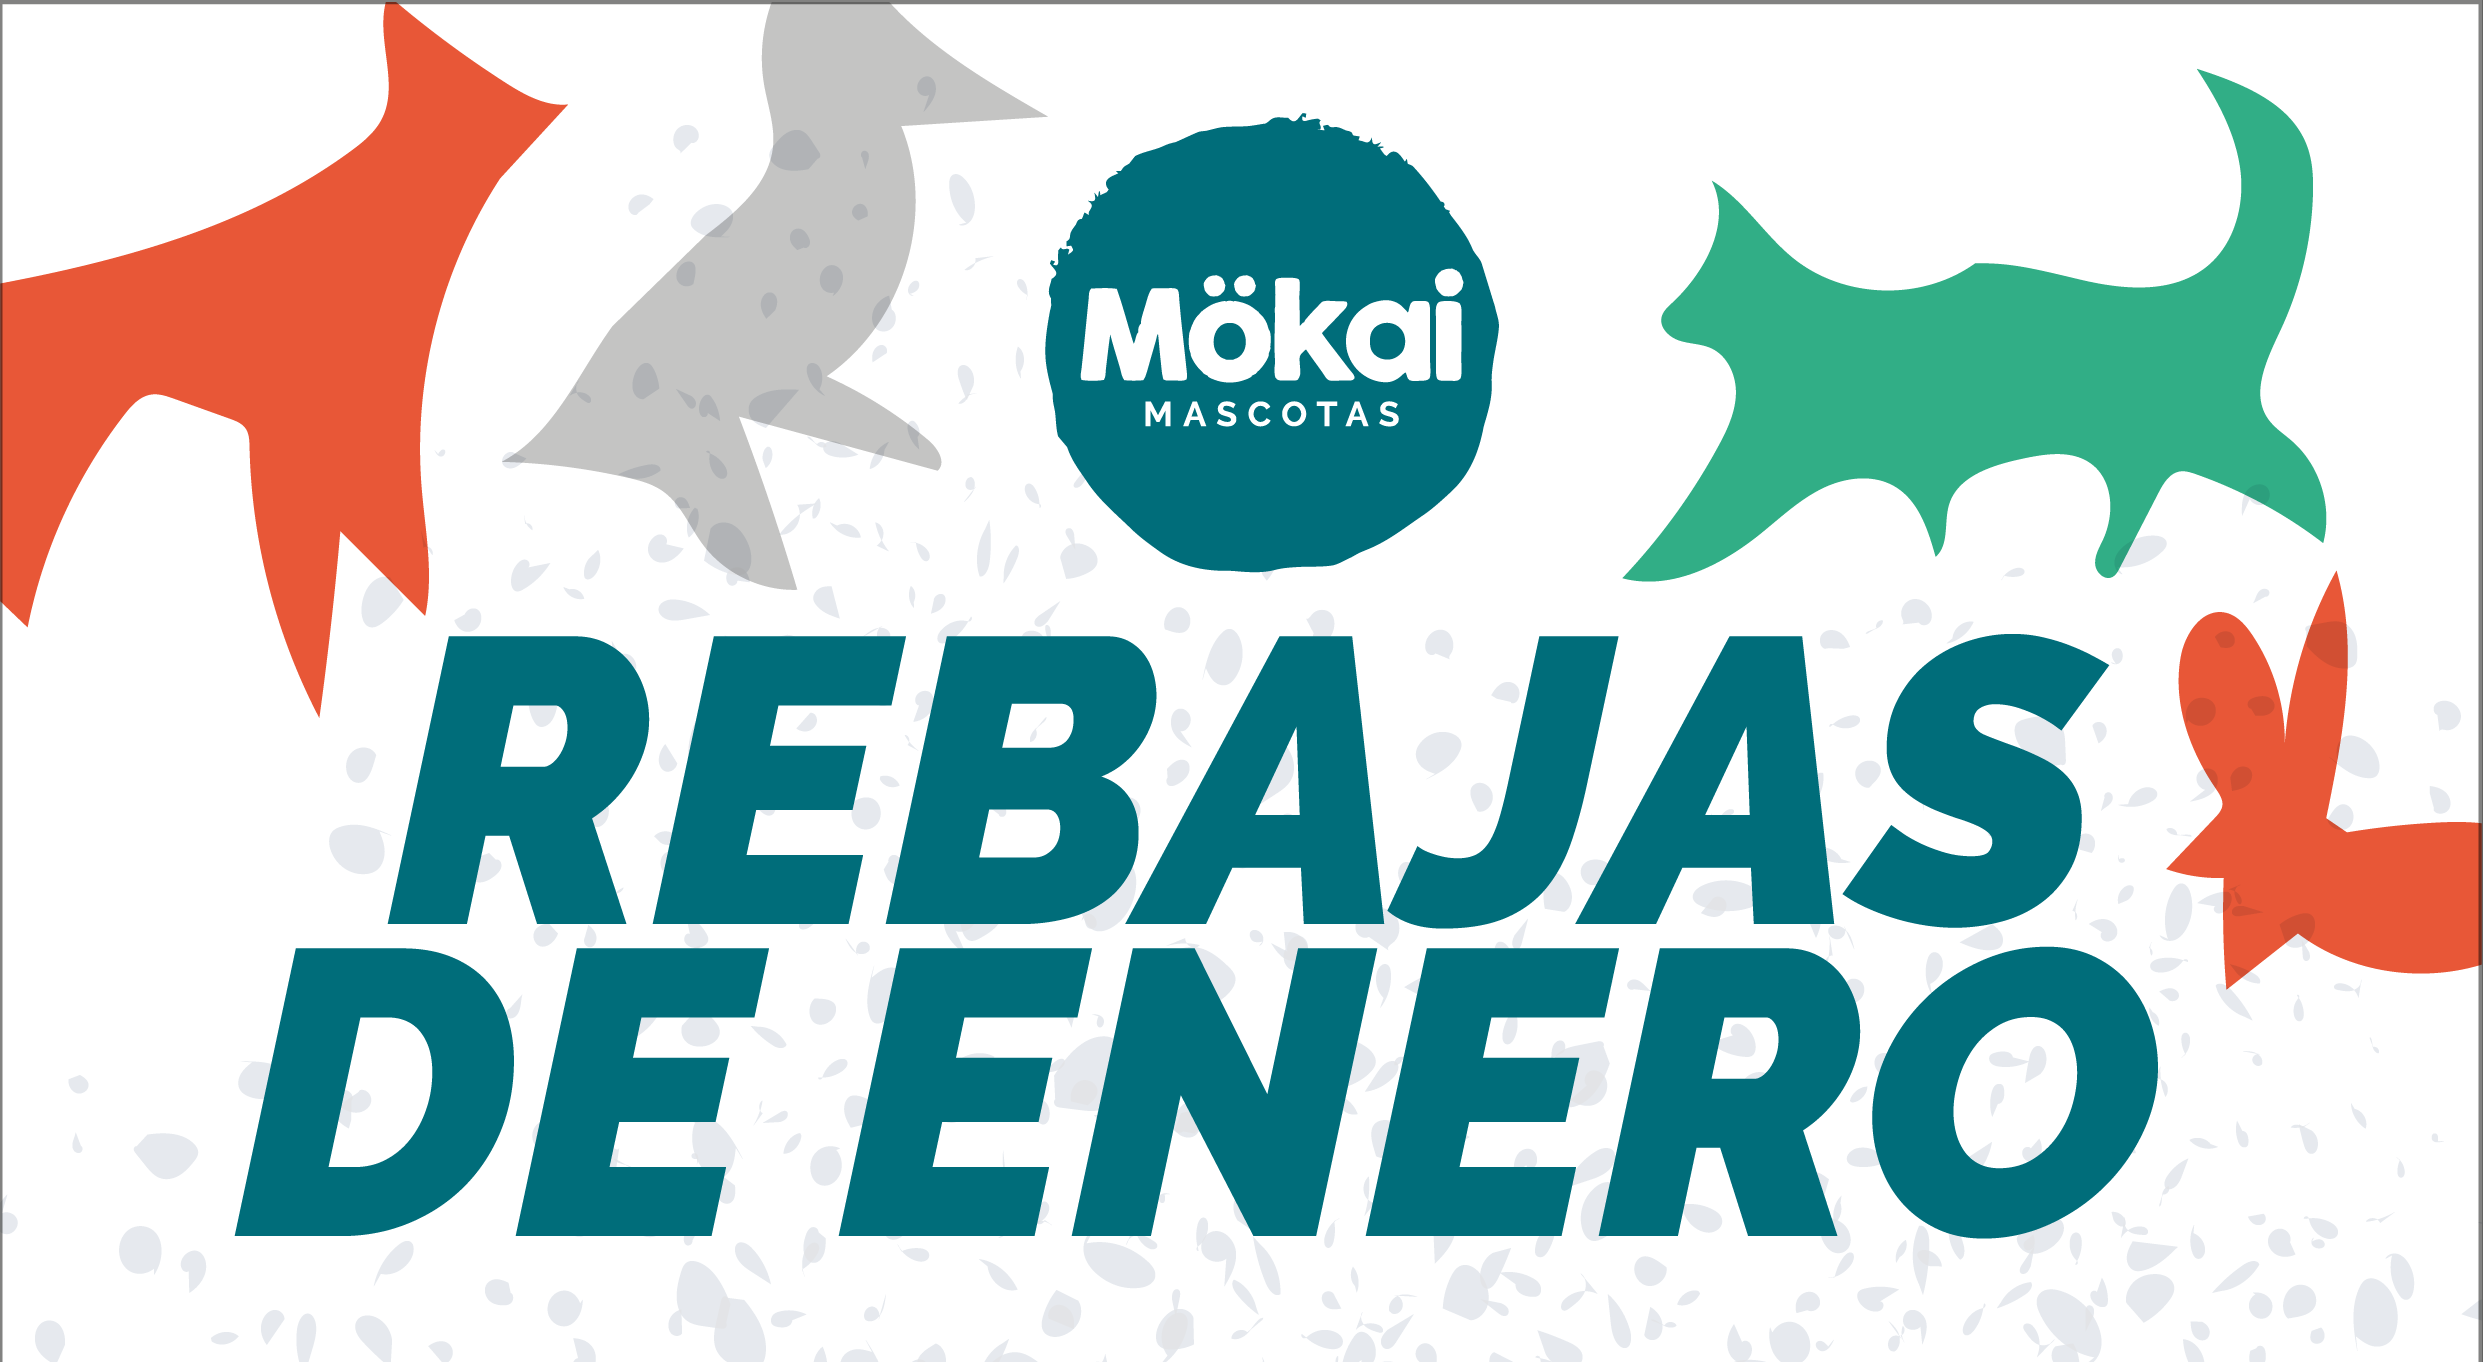 https://www.mokaimascotas.es/wp-content/uploads/2020/01/rebajas_enero.png